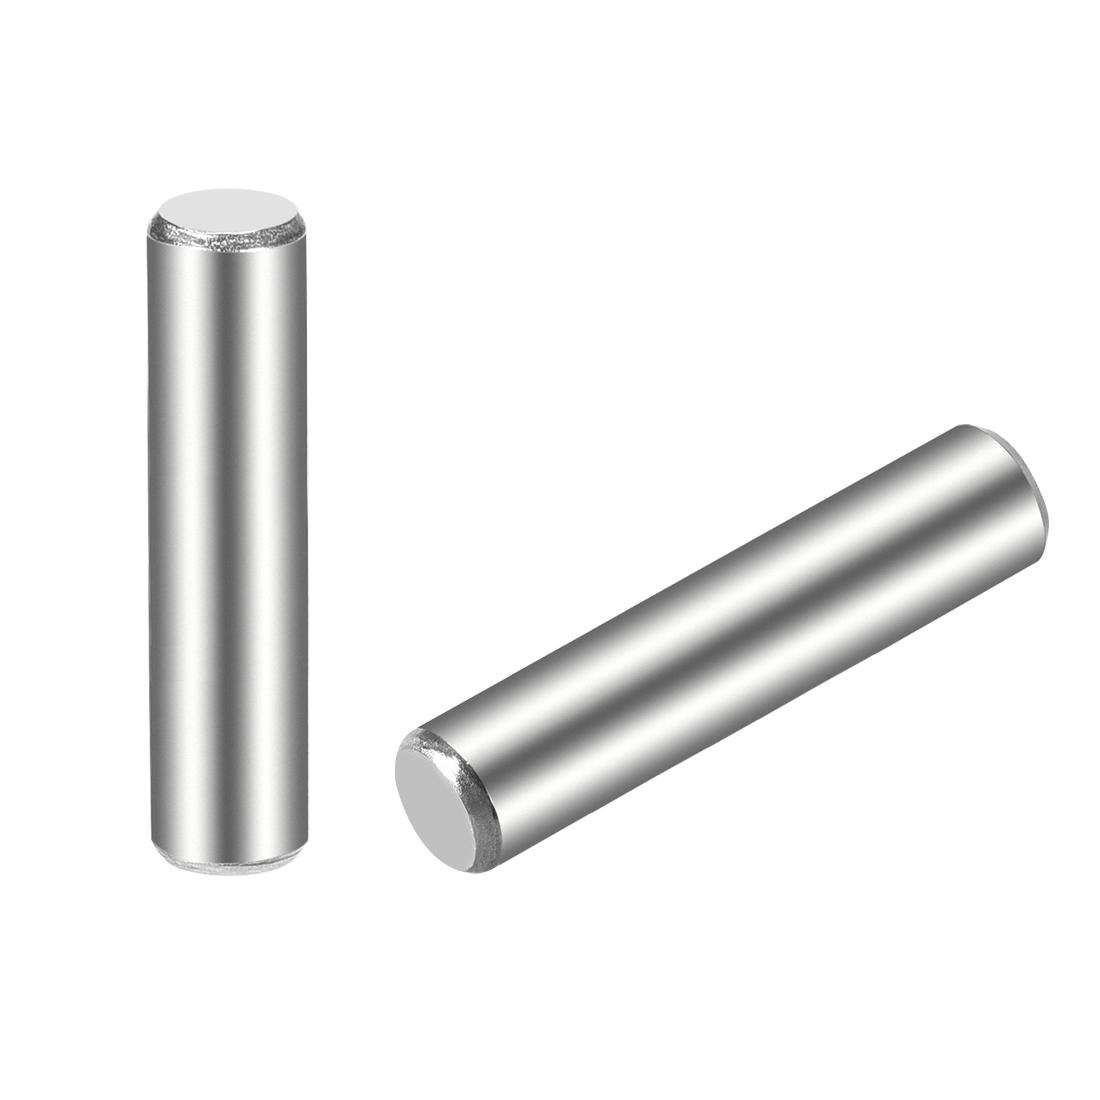 15Pcs 5mm x 25mm Dowel Pin 304 Stainless Steel Shelf Support Pin Fasten